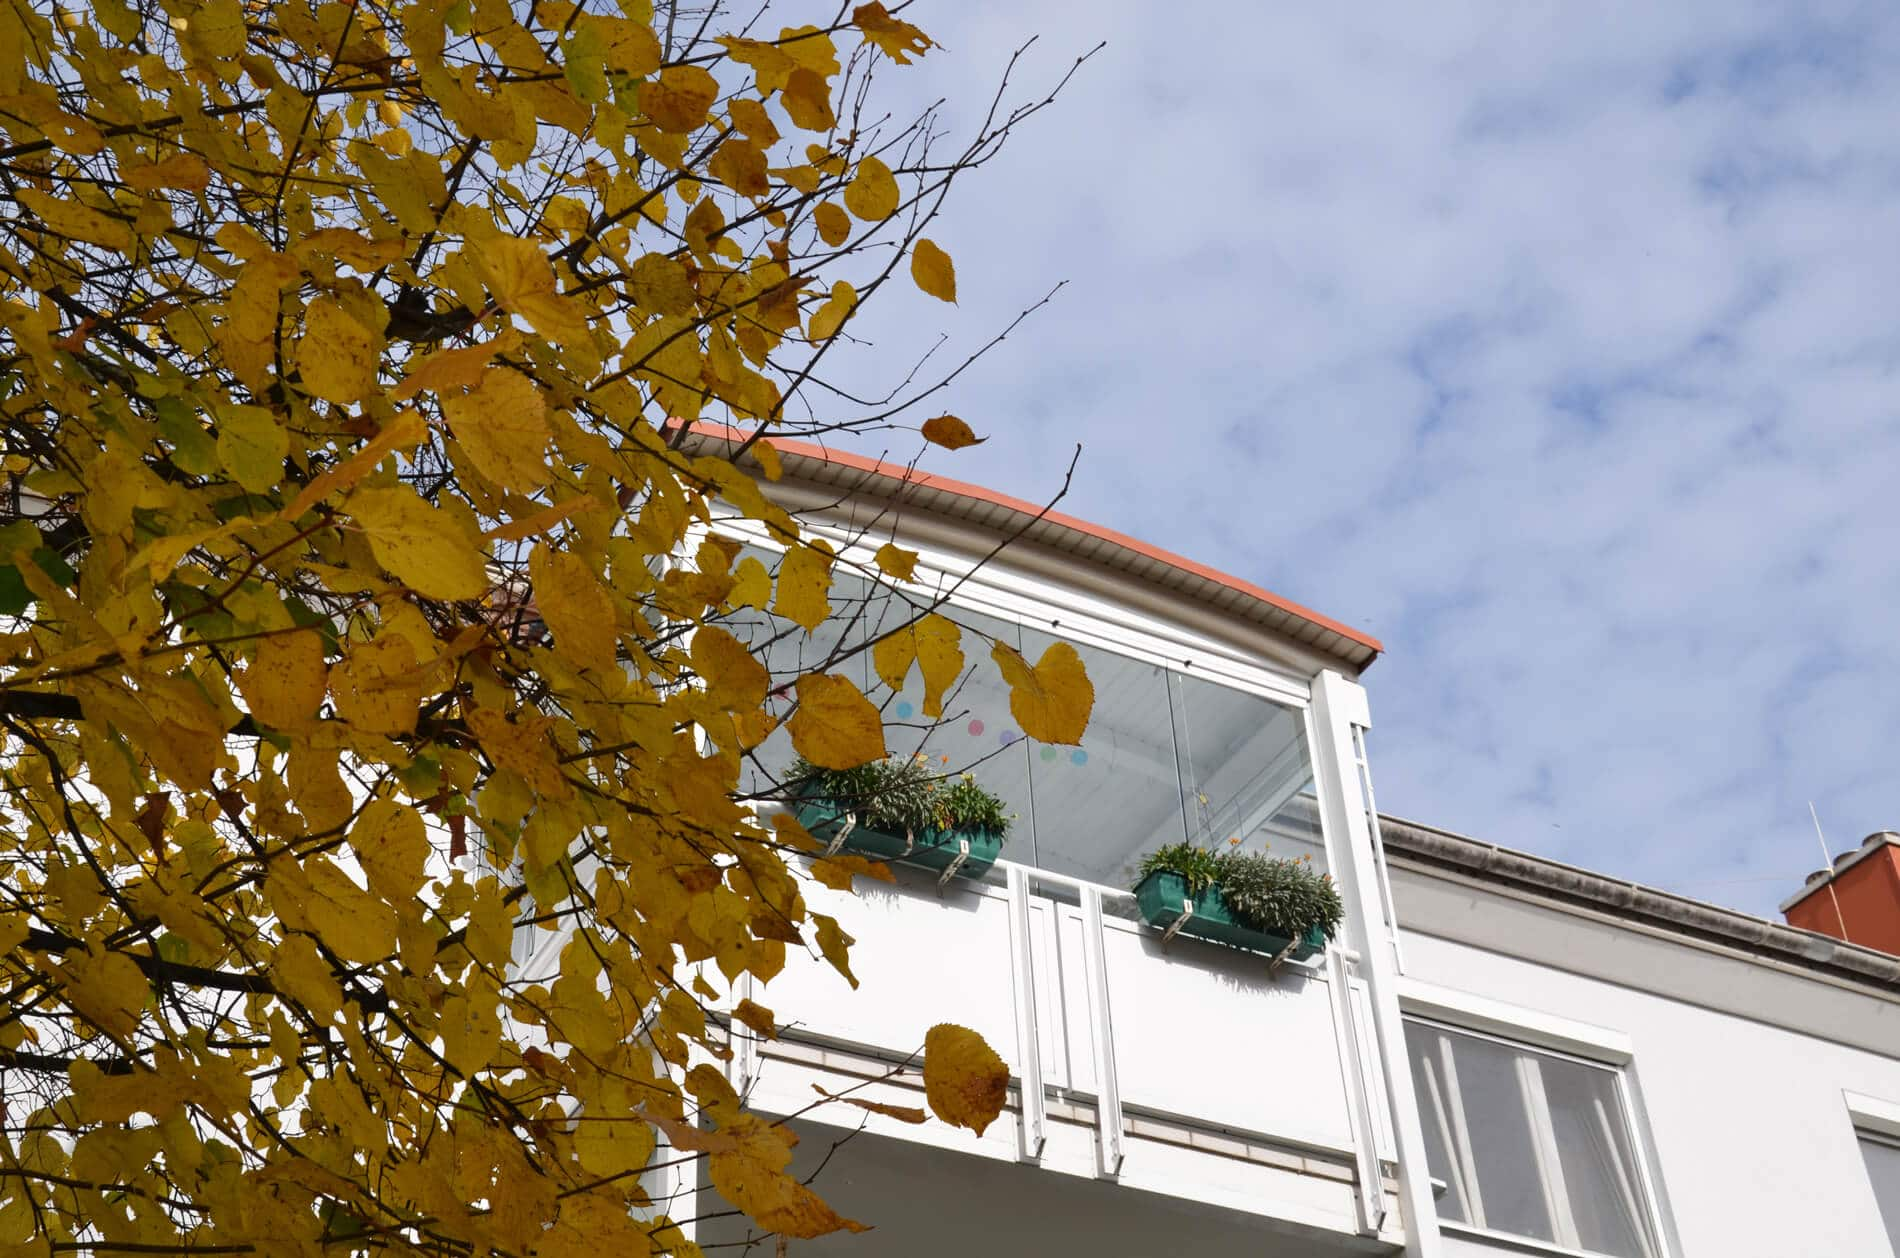 Balkon wetterfest machen